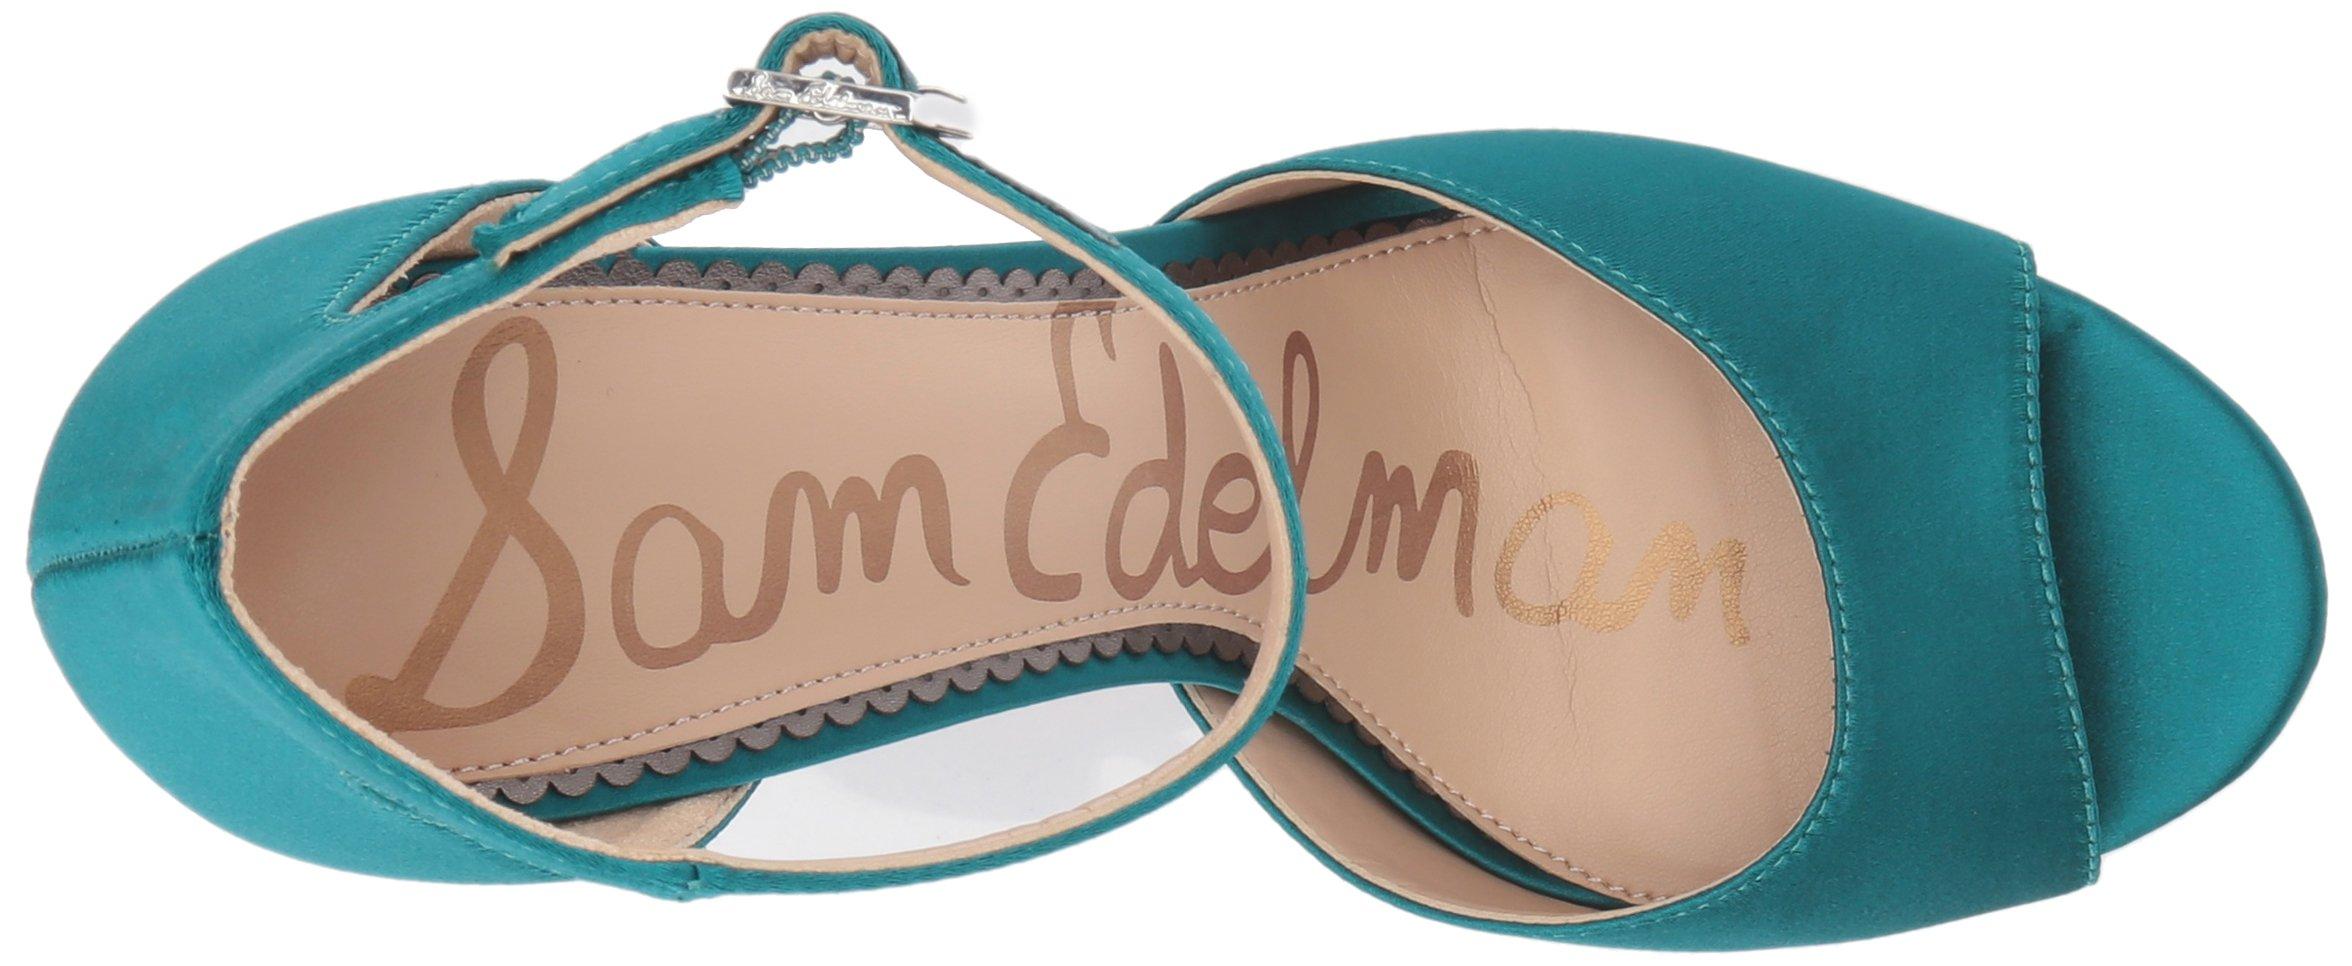 Sam Edelman Women's Wallace Heeled Sandal, Jungle Green Satin, 5 Medium US by Sam Edelman (Image #8)